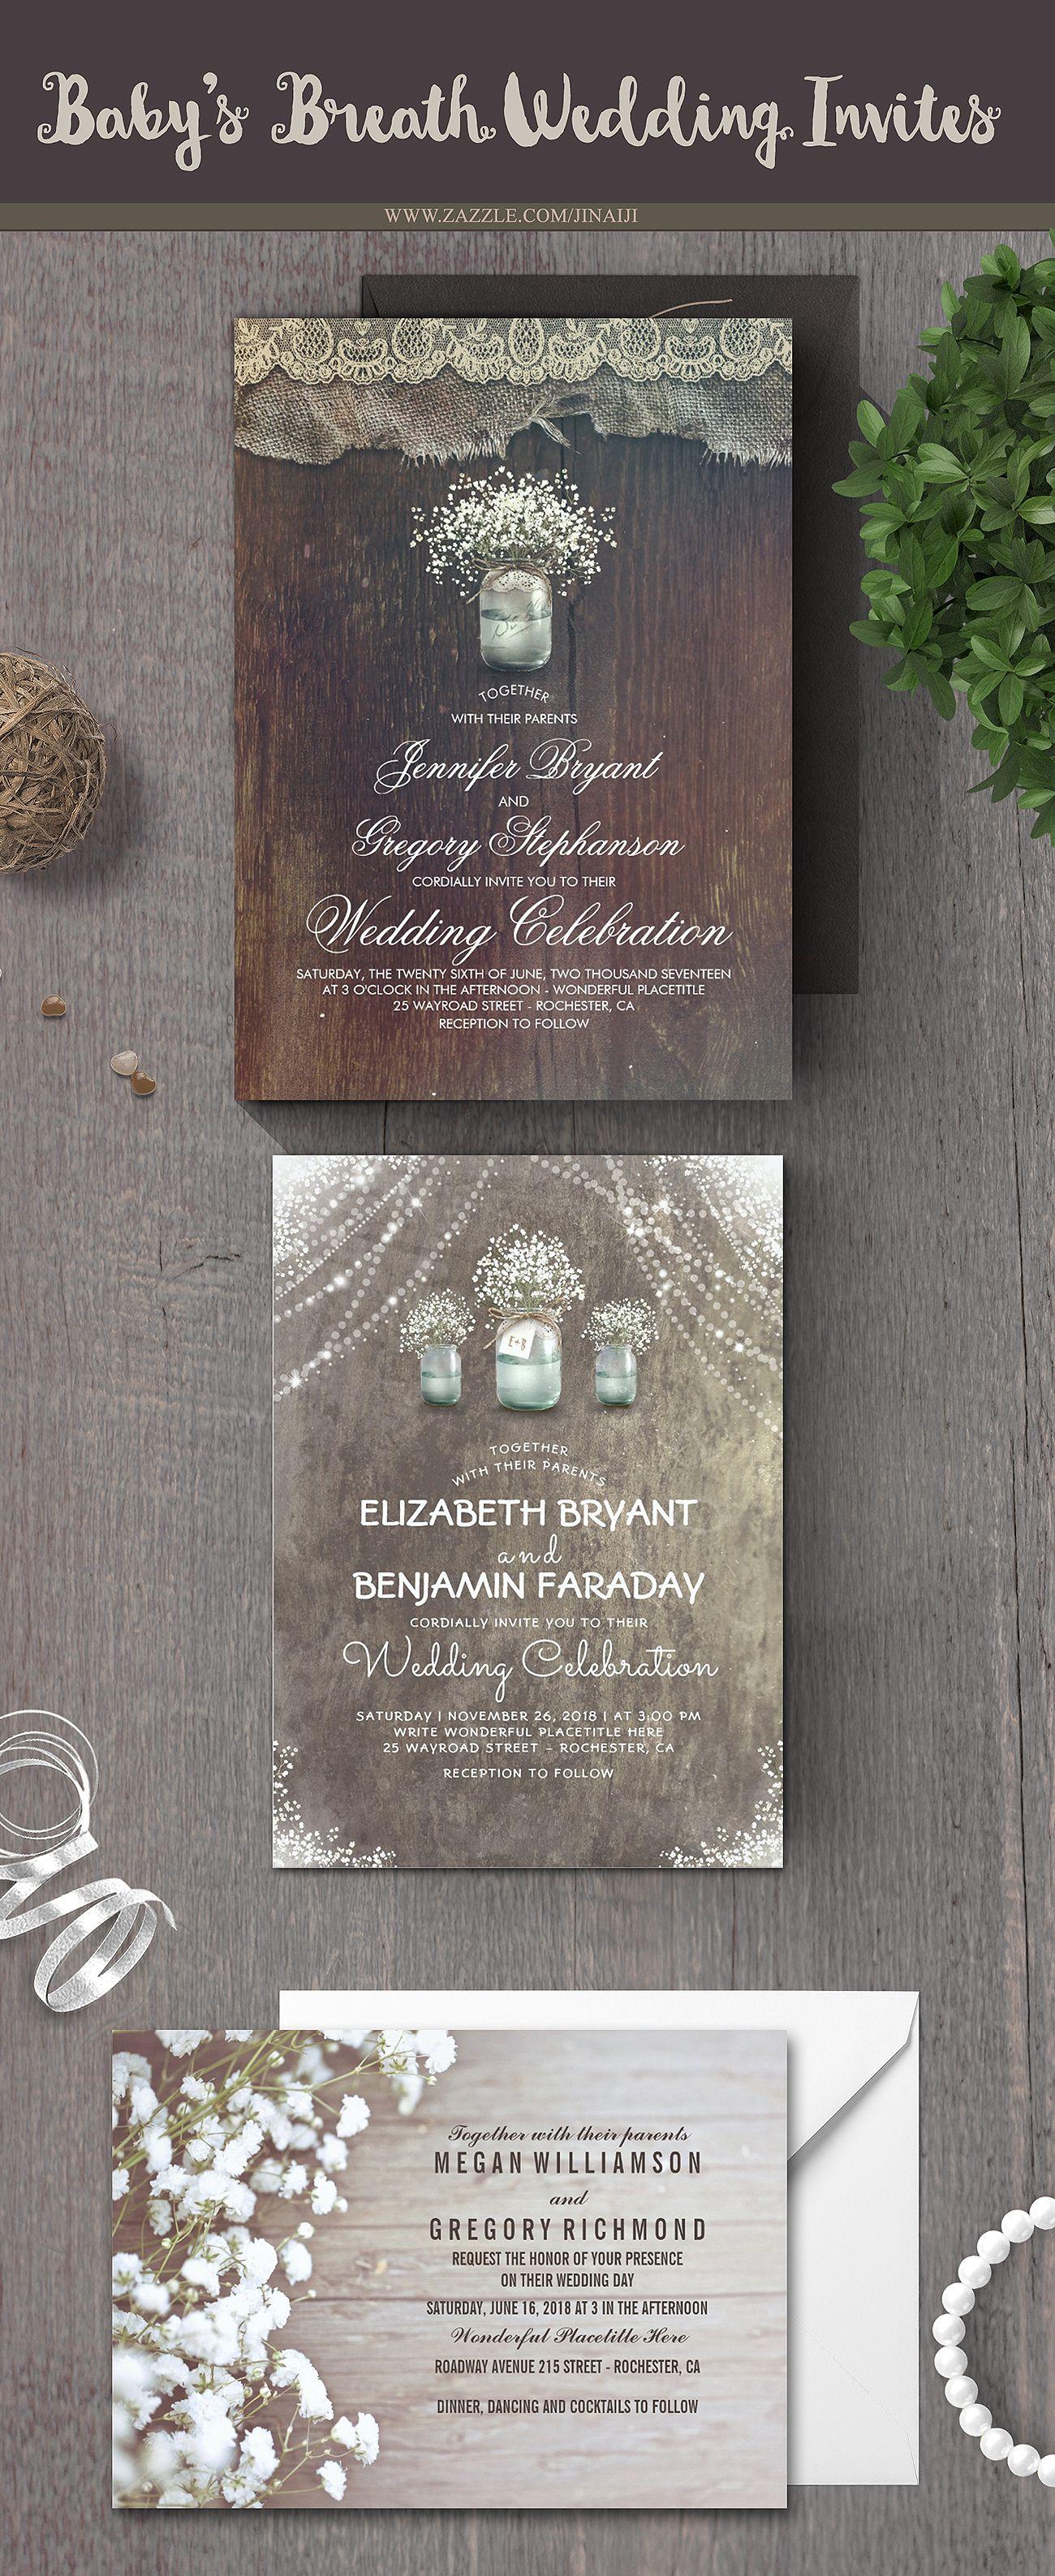 Wedding decorations with flowers november 2018 Rustic Country Mason Jar and Babyus Breath Wedding Card  th